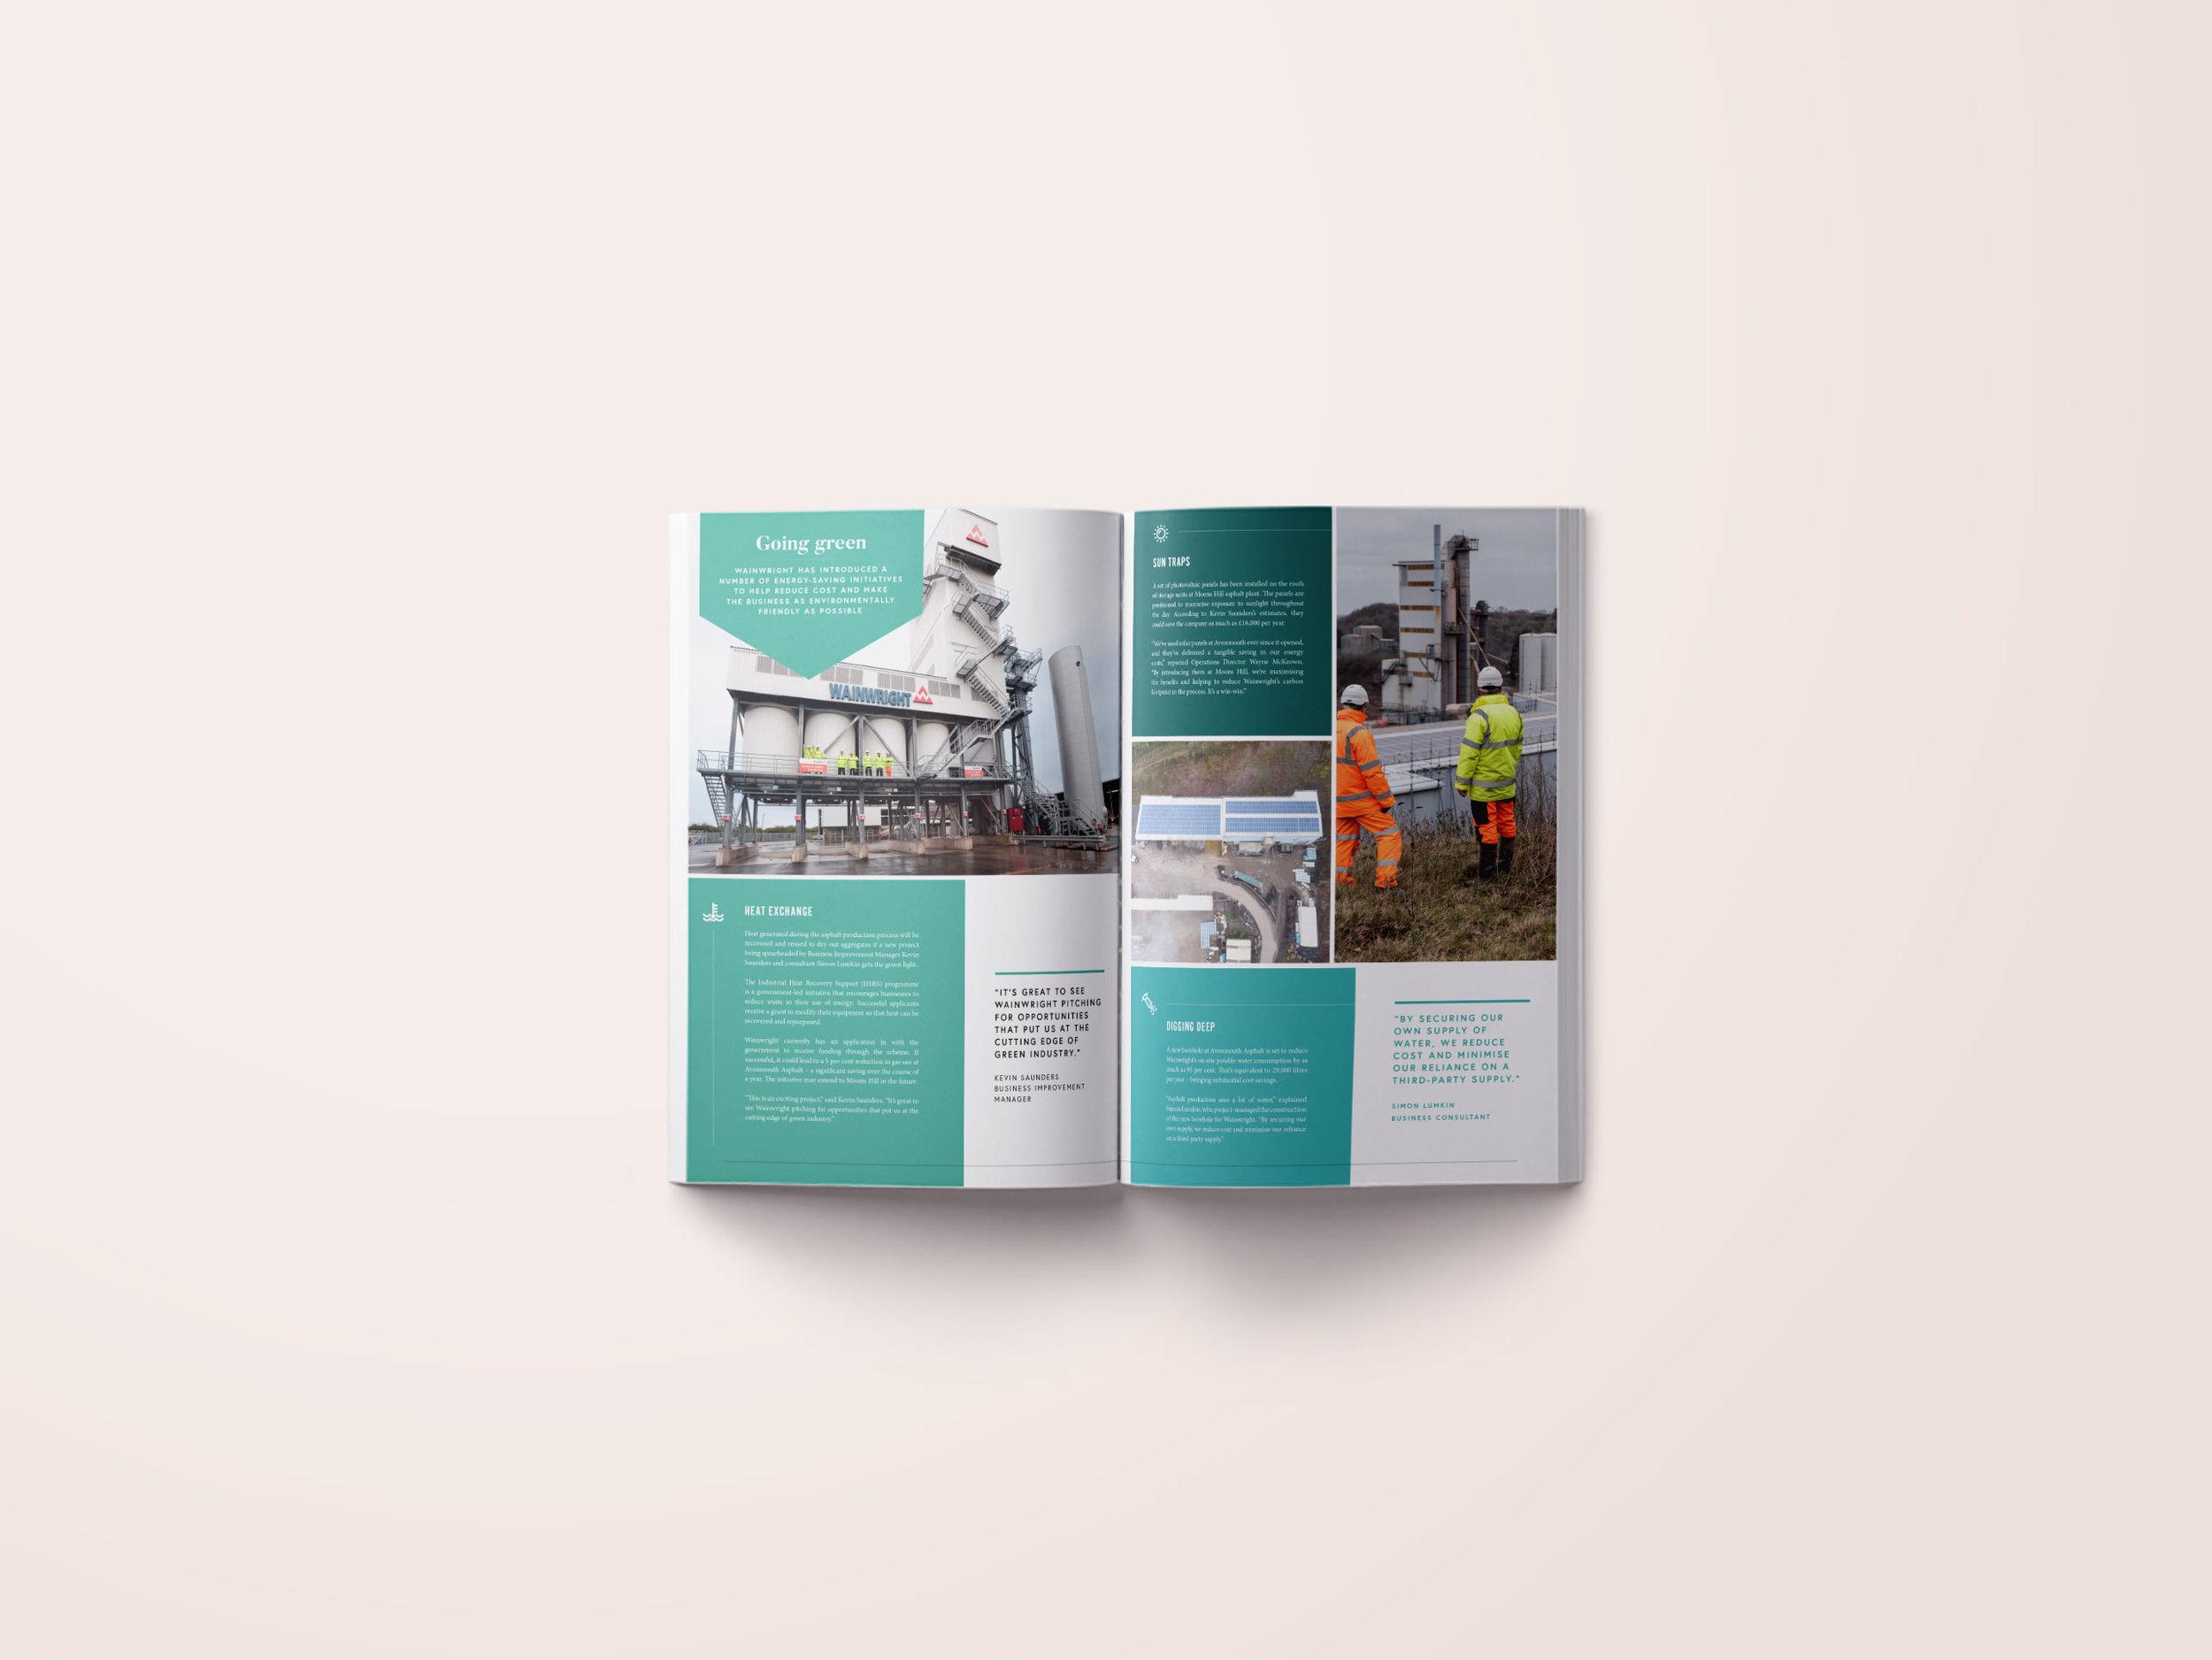 Graphic-Design-Studio-Somerset-Ilminster-10.jpg